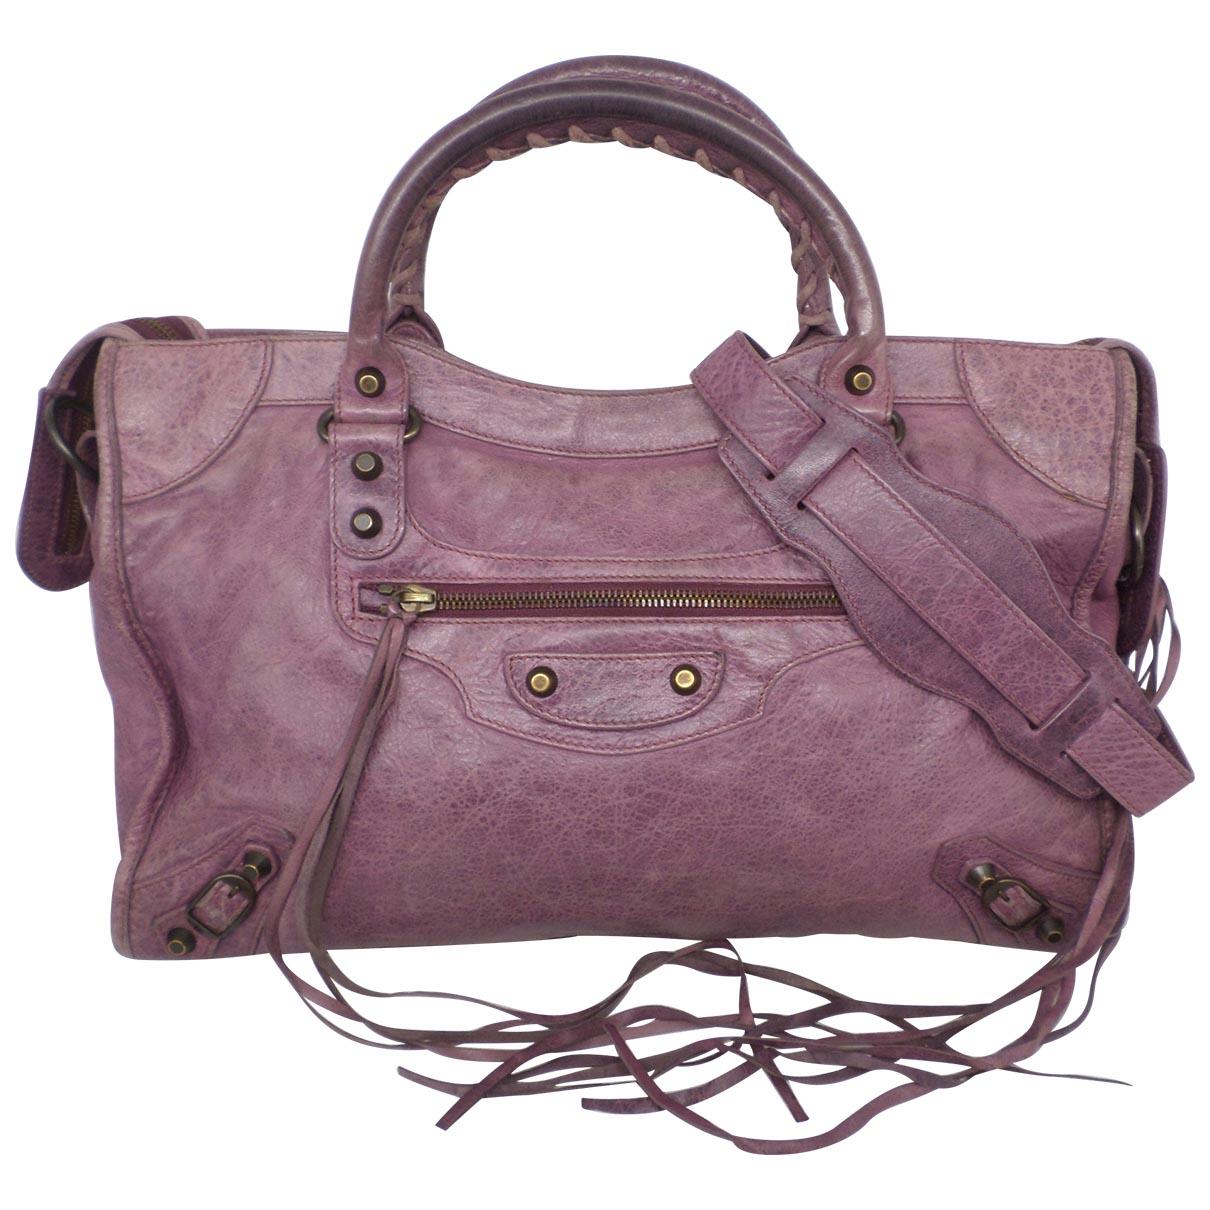 Balenciaga - Sac a main City pour femme en cuir - violet